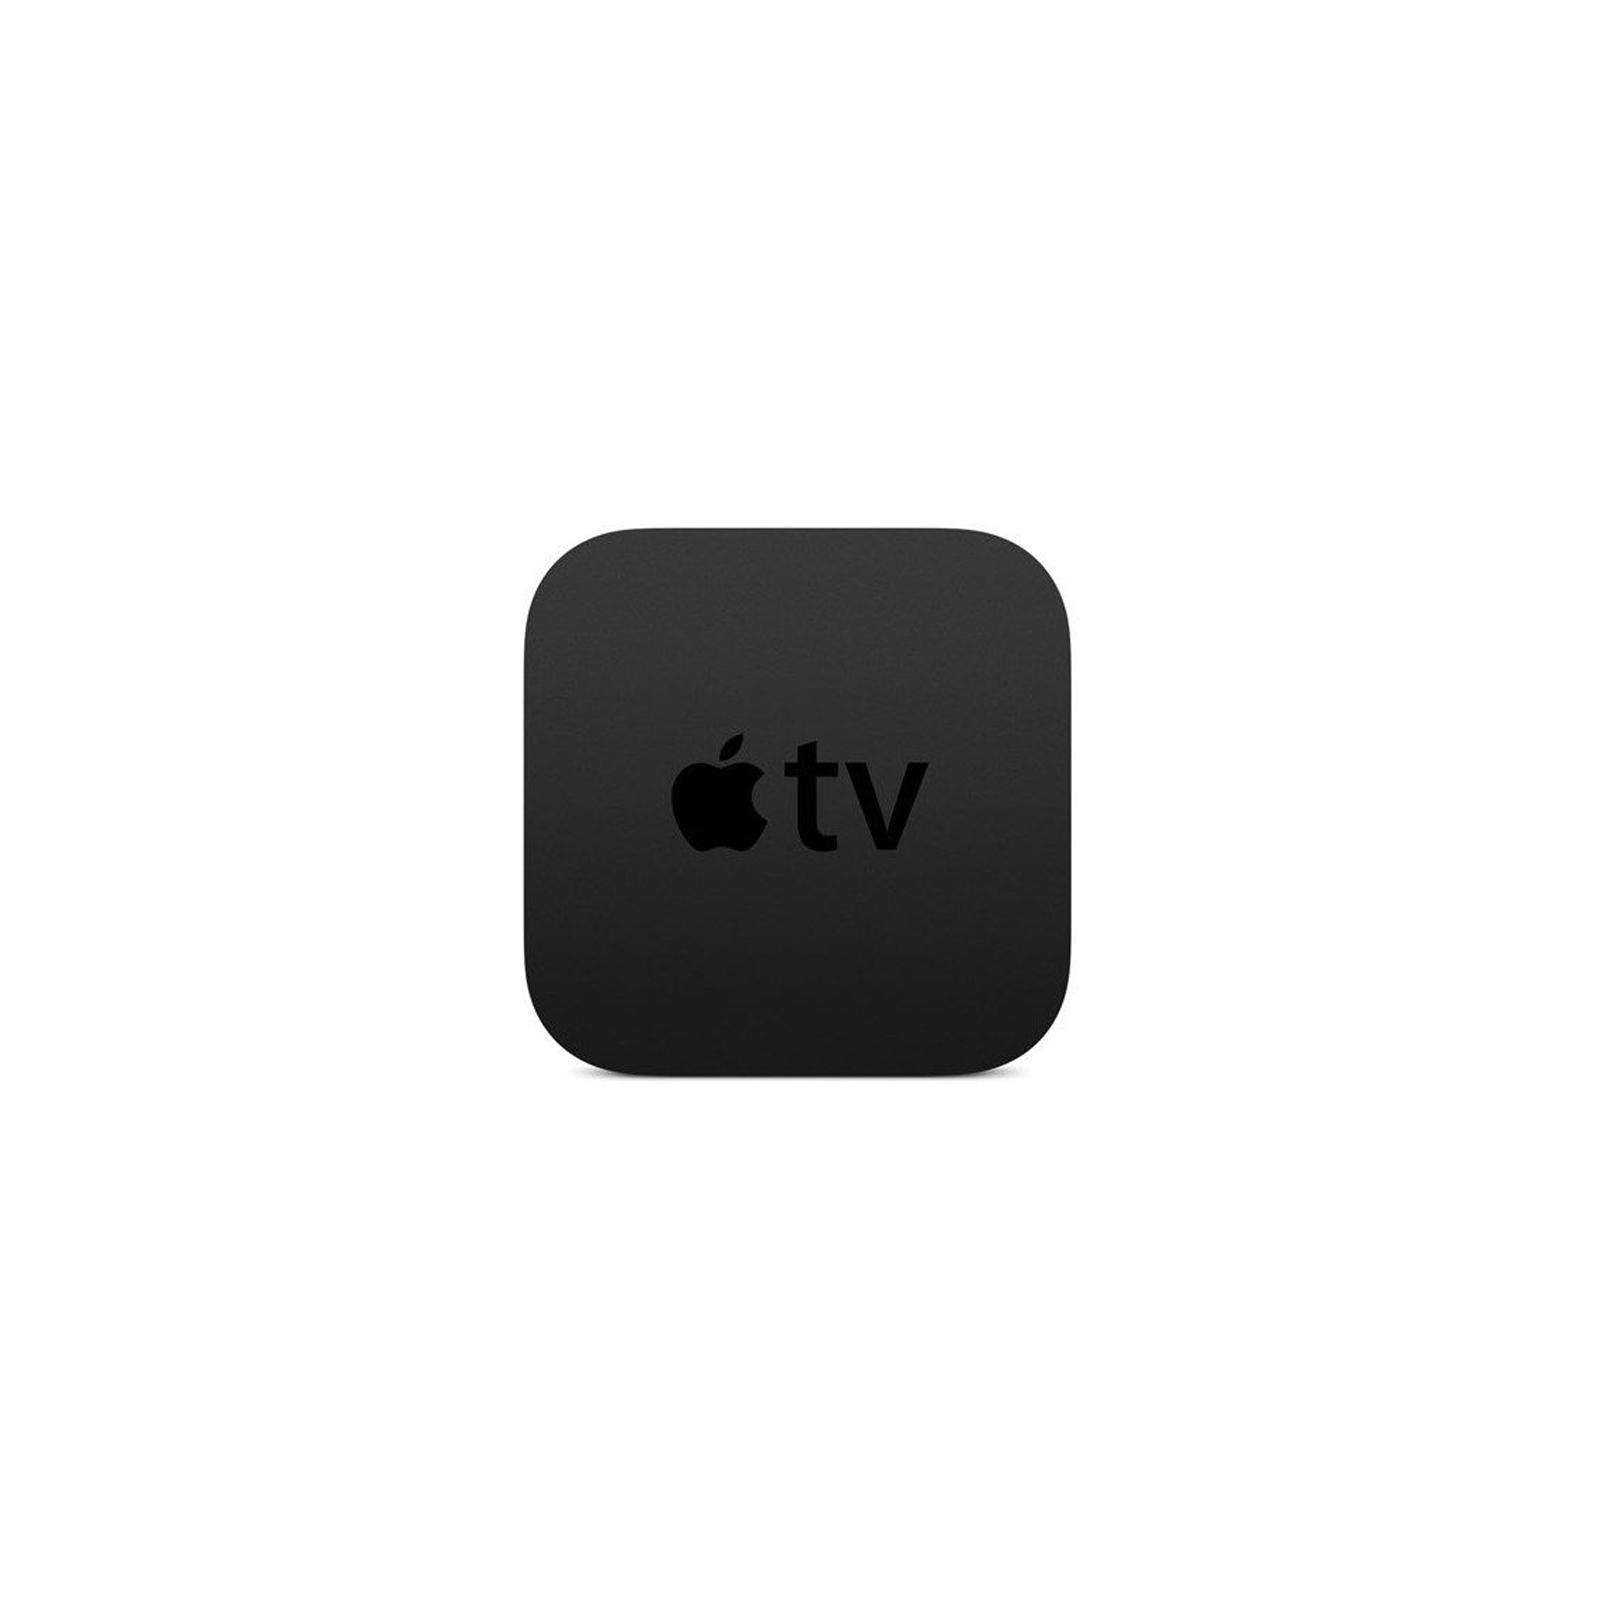 Медиаплеер Apple TV A1625 64GB (MLNC2RS/A) изображение 2